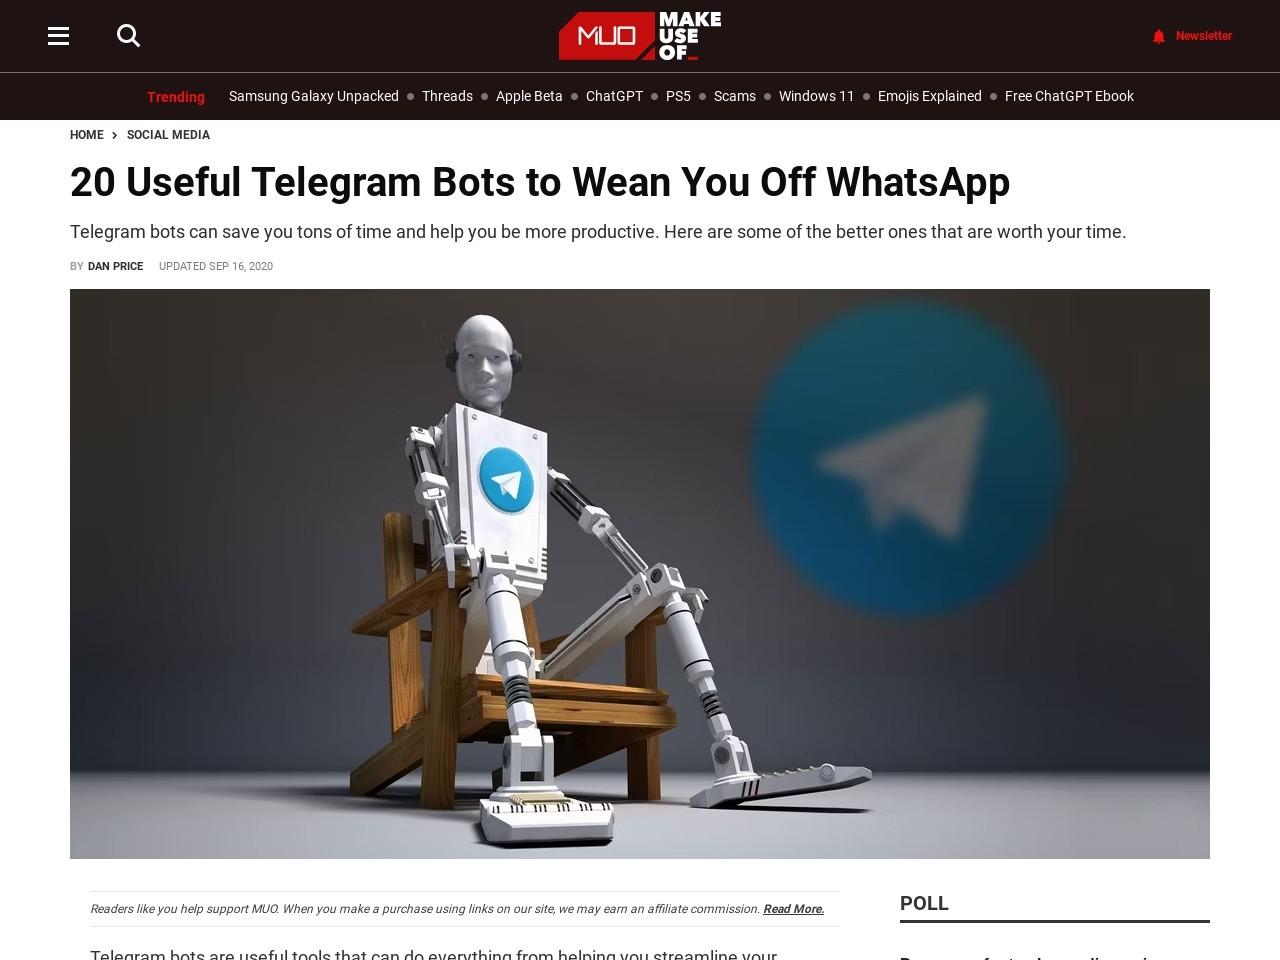 20 Useful Telegram Bots to Wean You Off WhatsApp